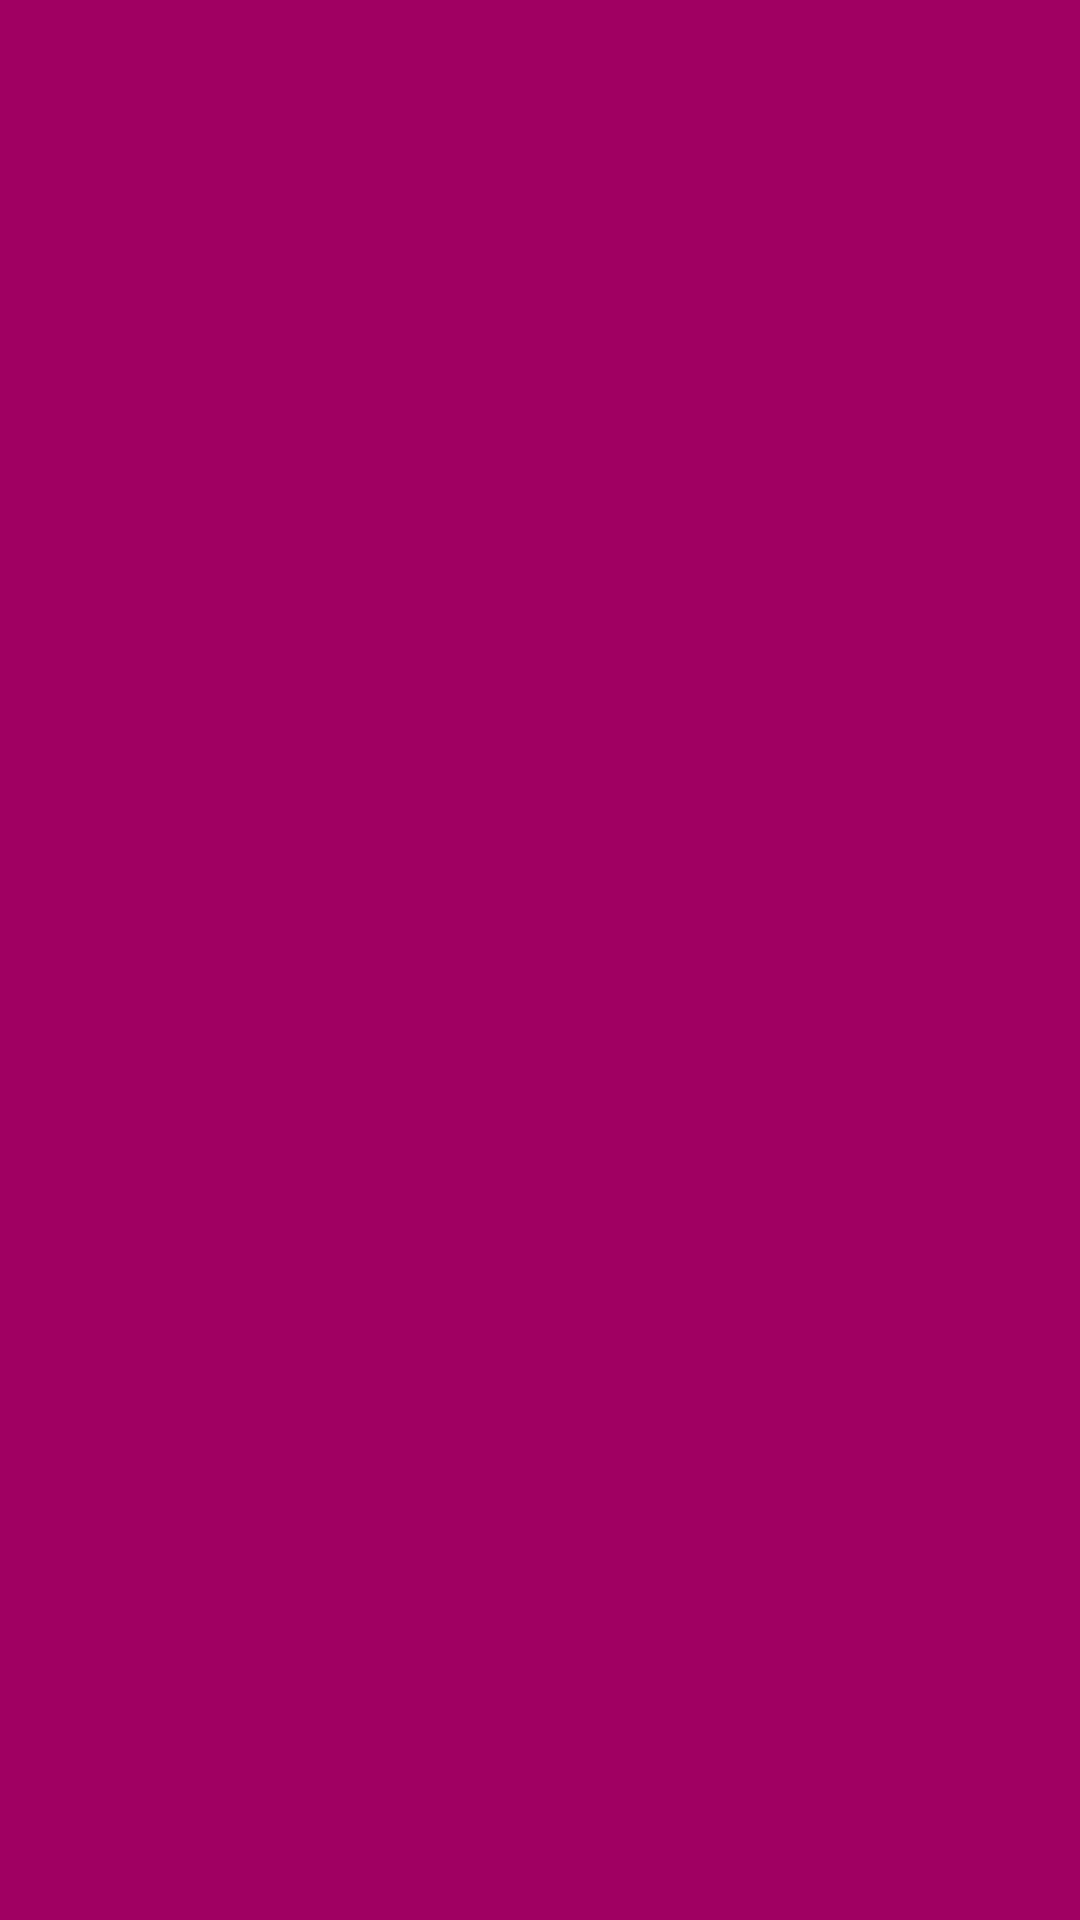 9E0062 Solid Color Image Httpswwwsolidcolorecom9E0062Htm #Solid # Color Wallpaper #Background